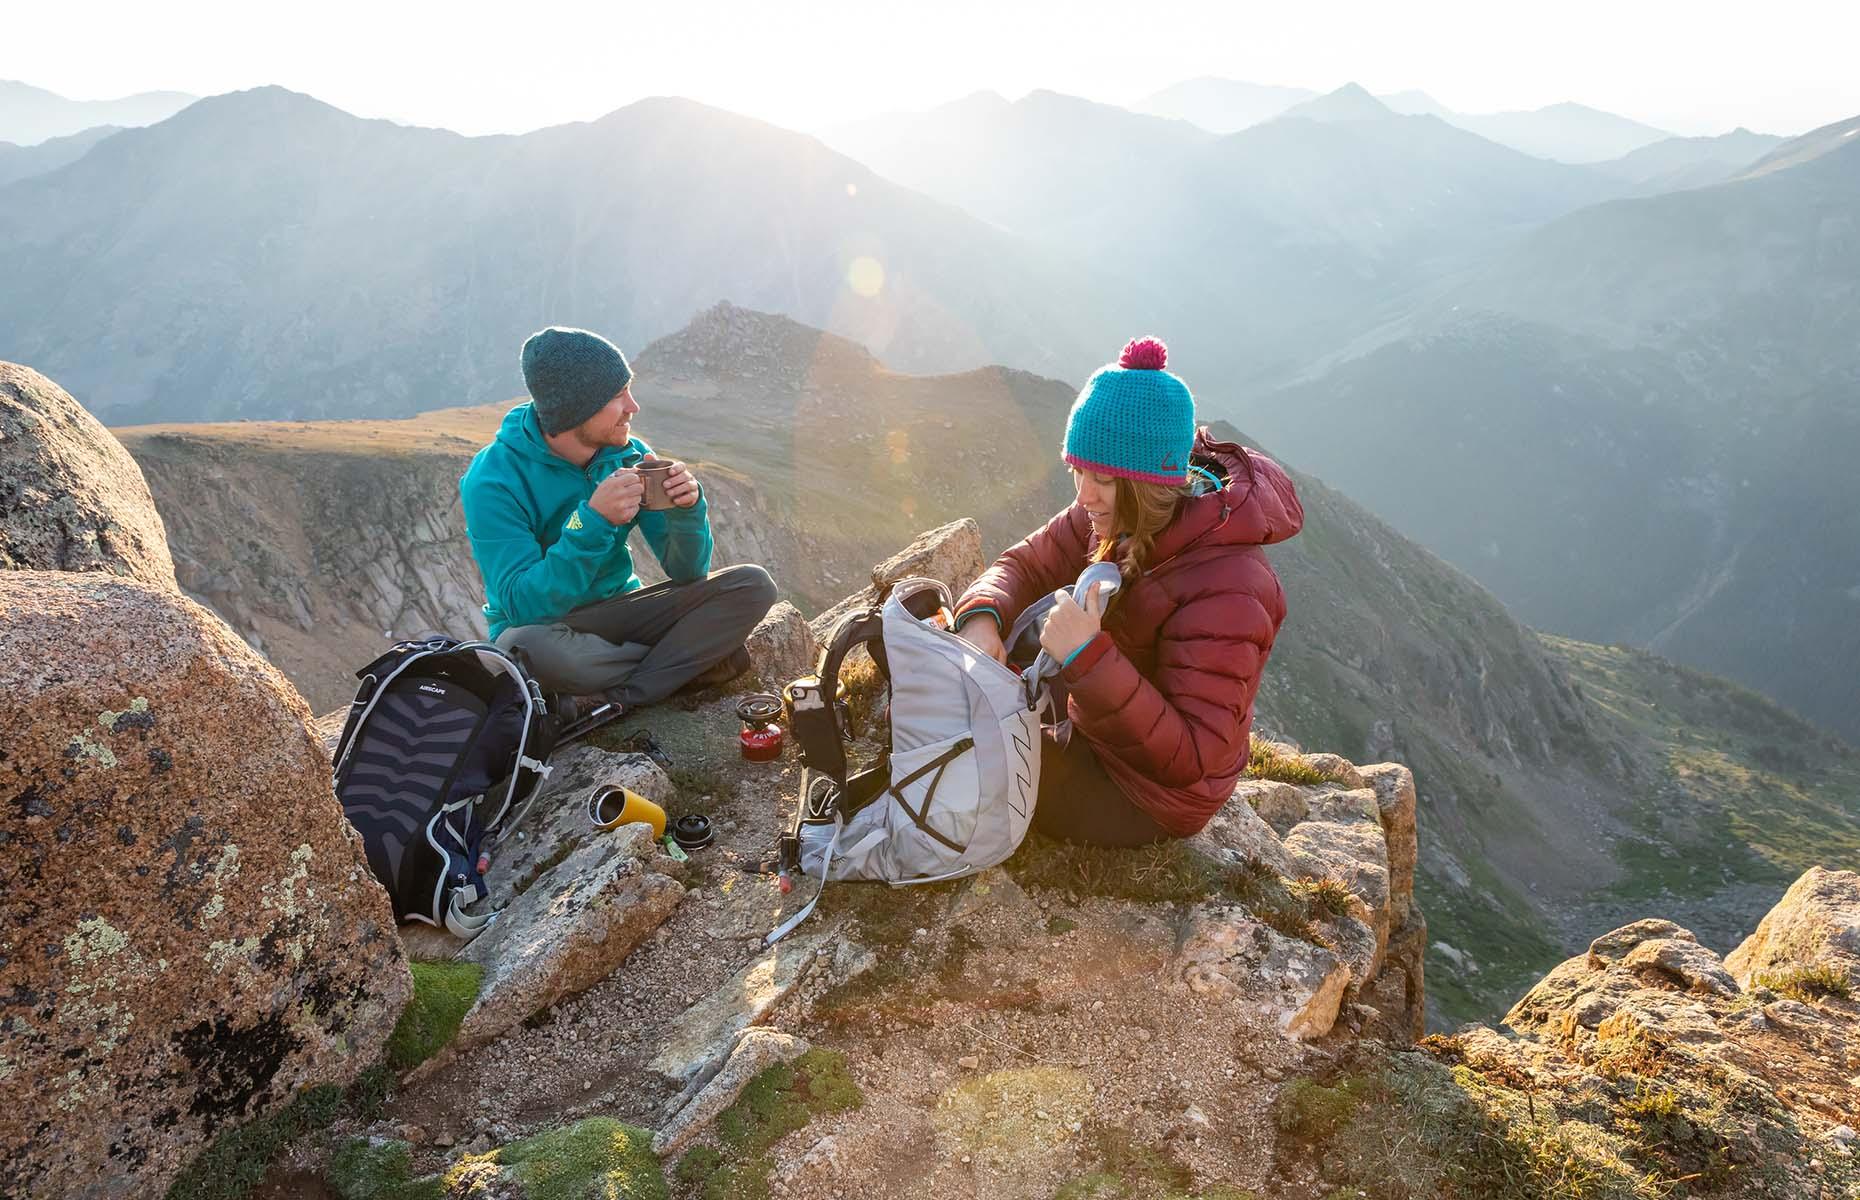 Win an Osprey hiking bundle worth £220